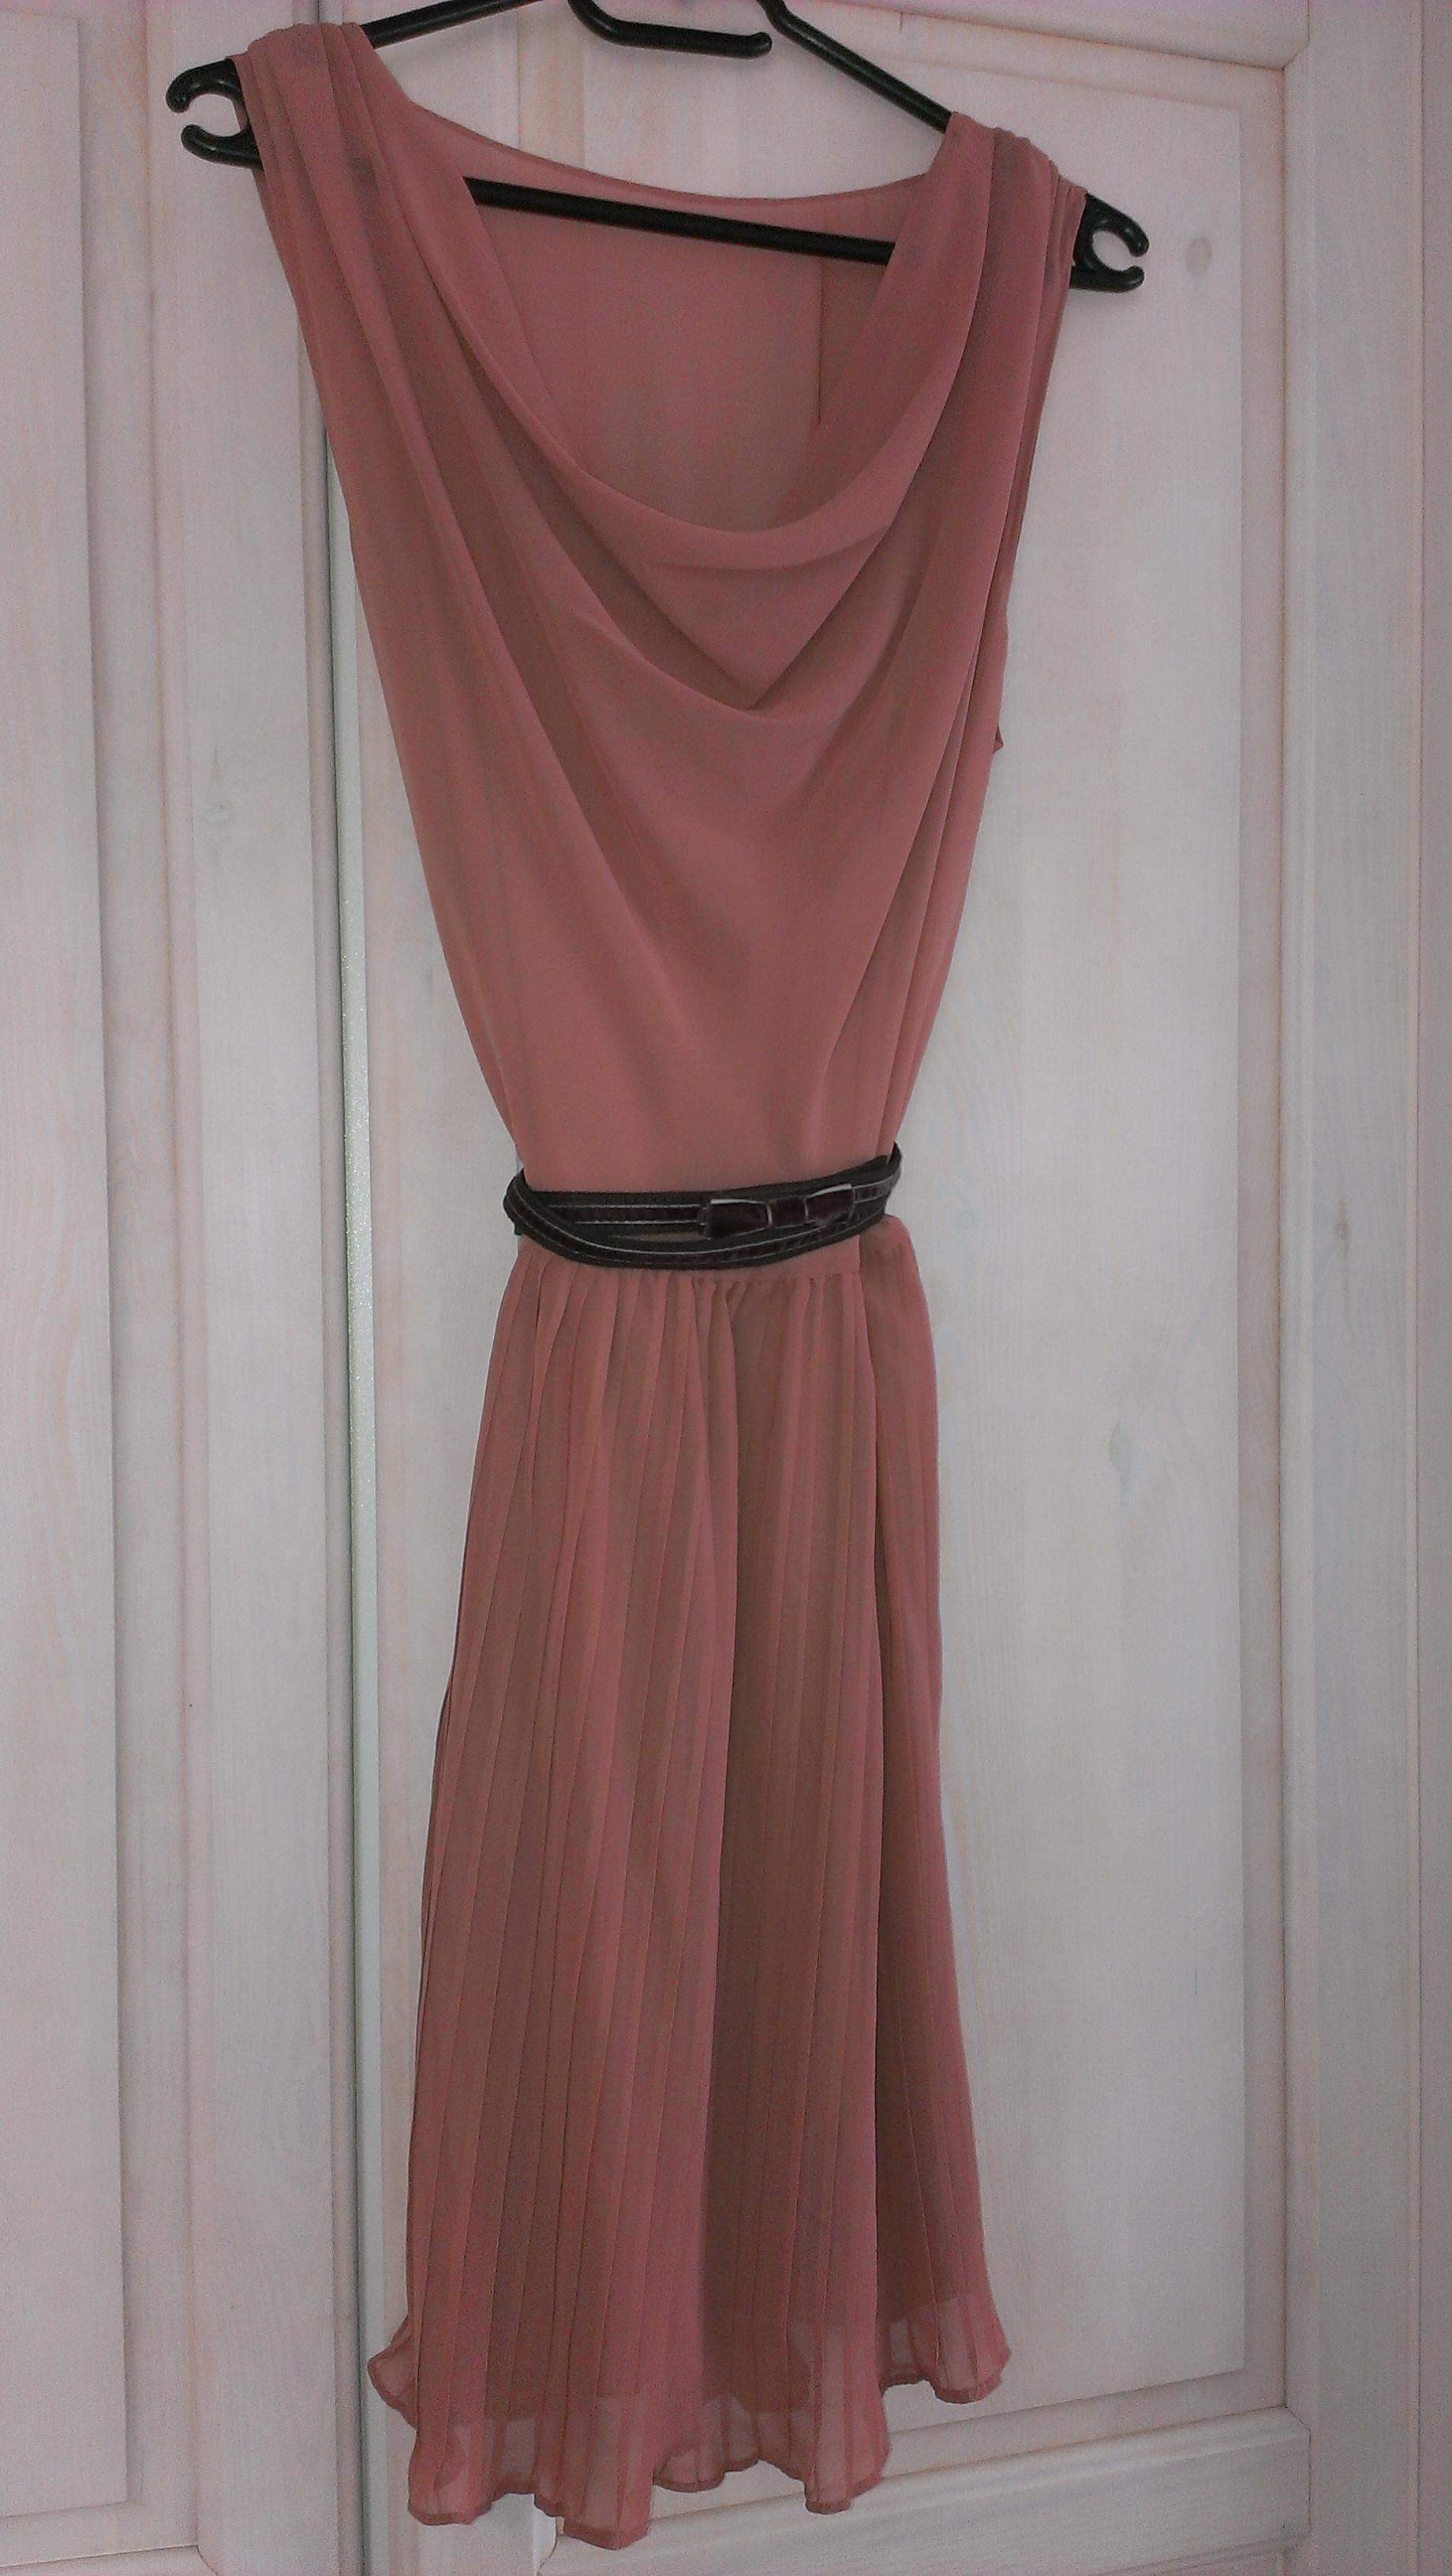 Dianas Kleid No. 1